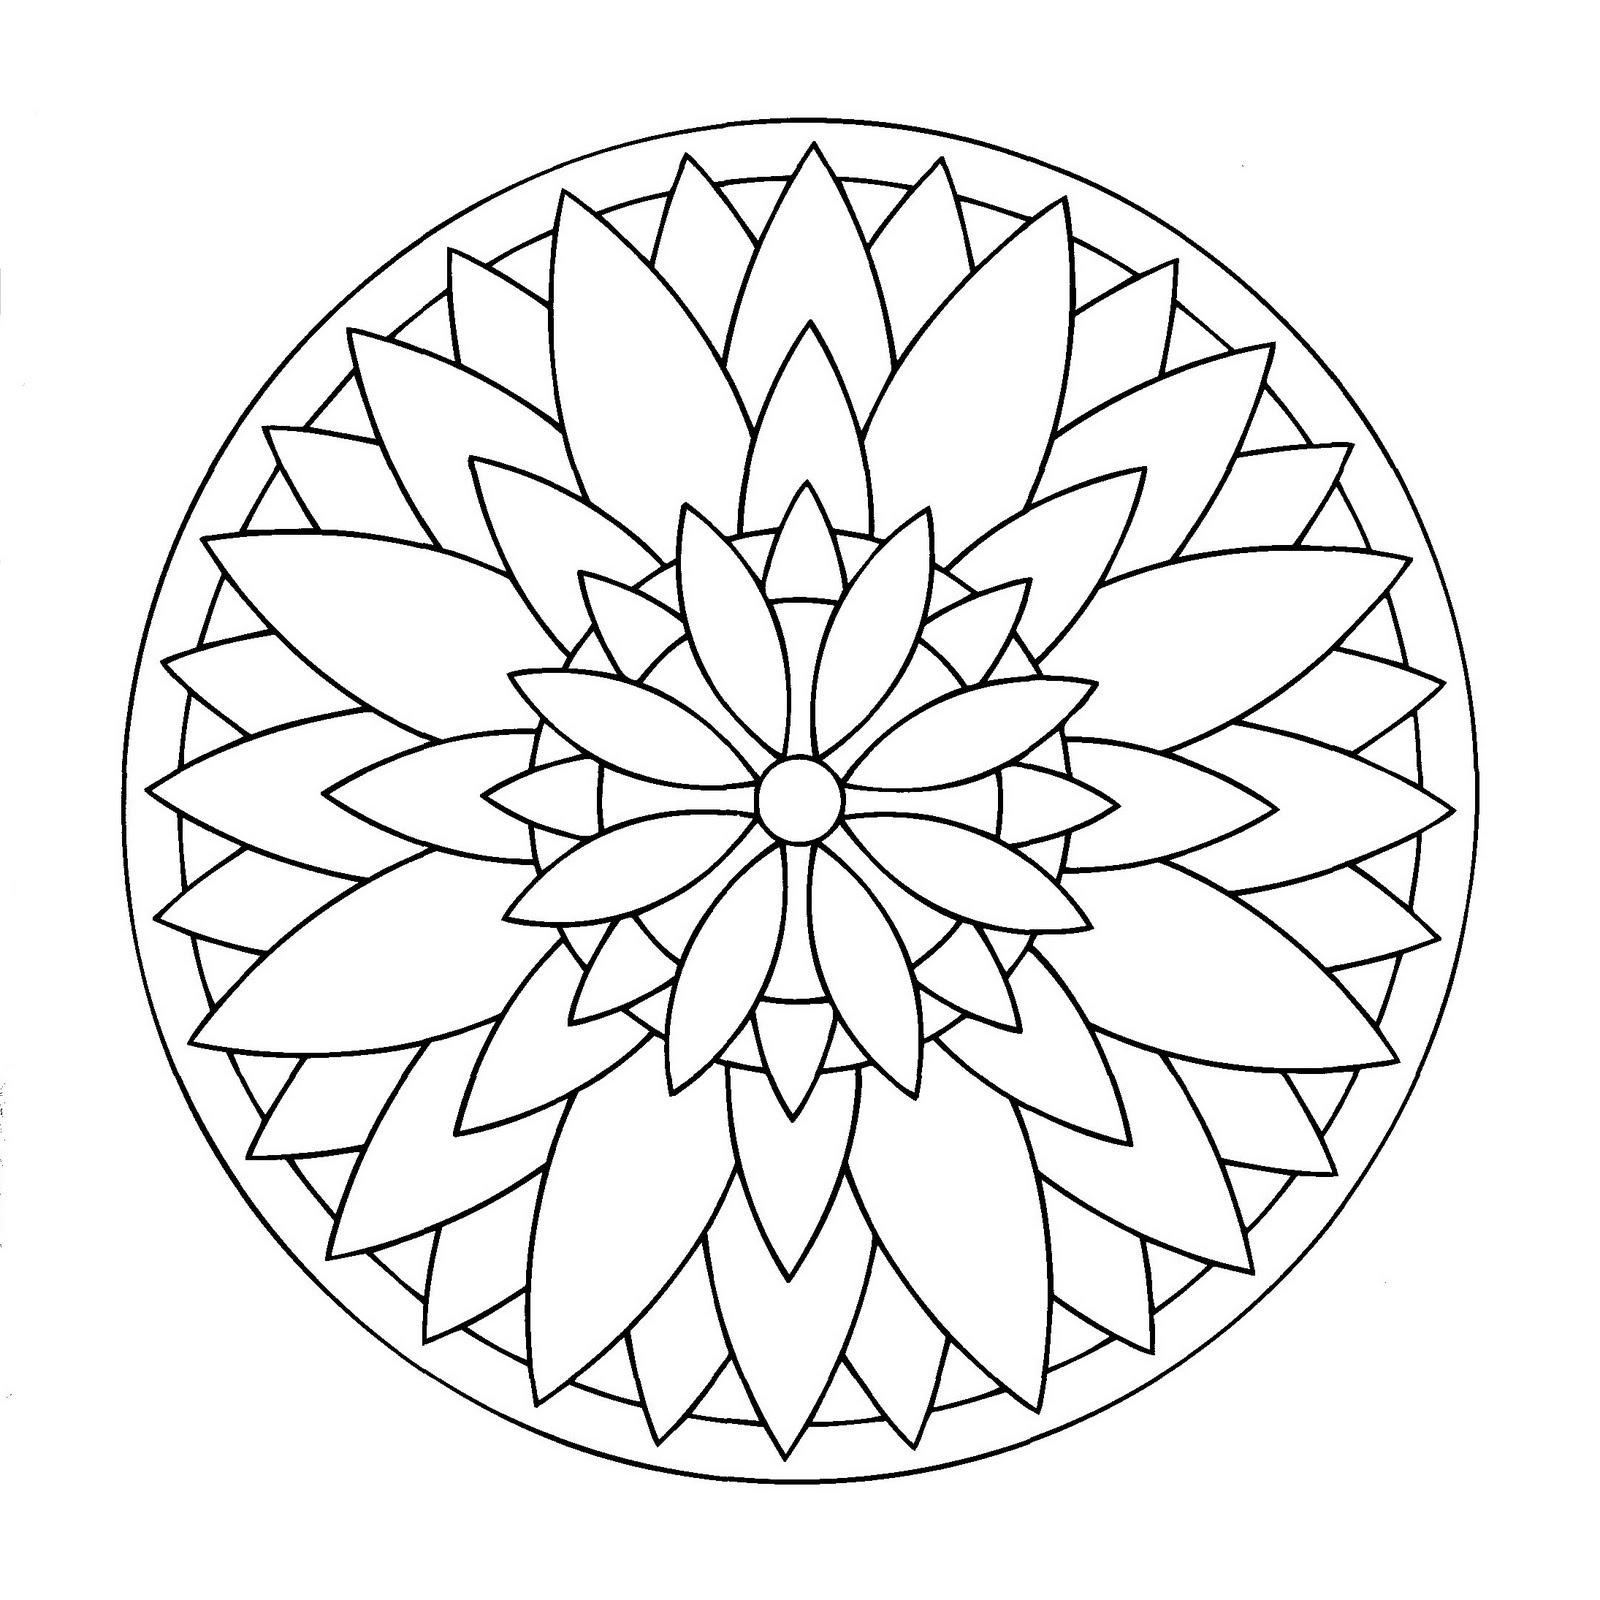 Mandalas Calaveras Para Colorear. Mandala Picos De Pjaros Mandala ...